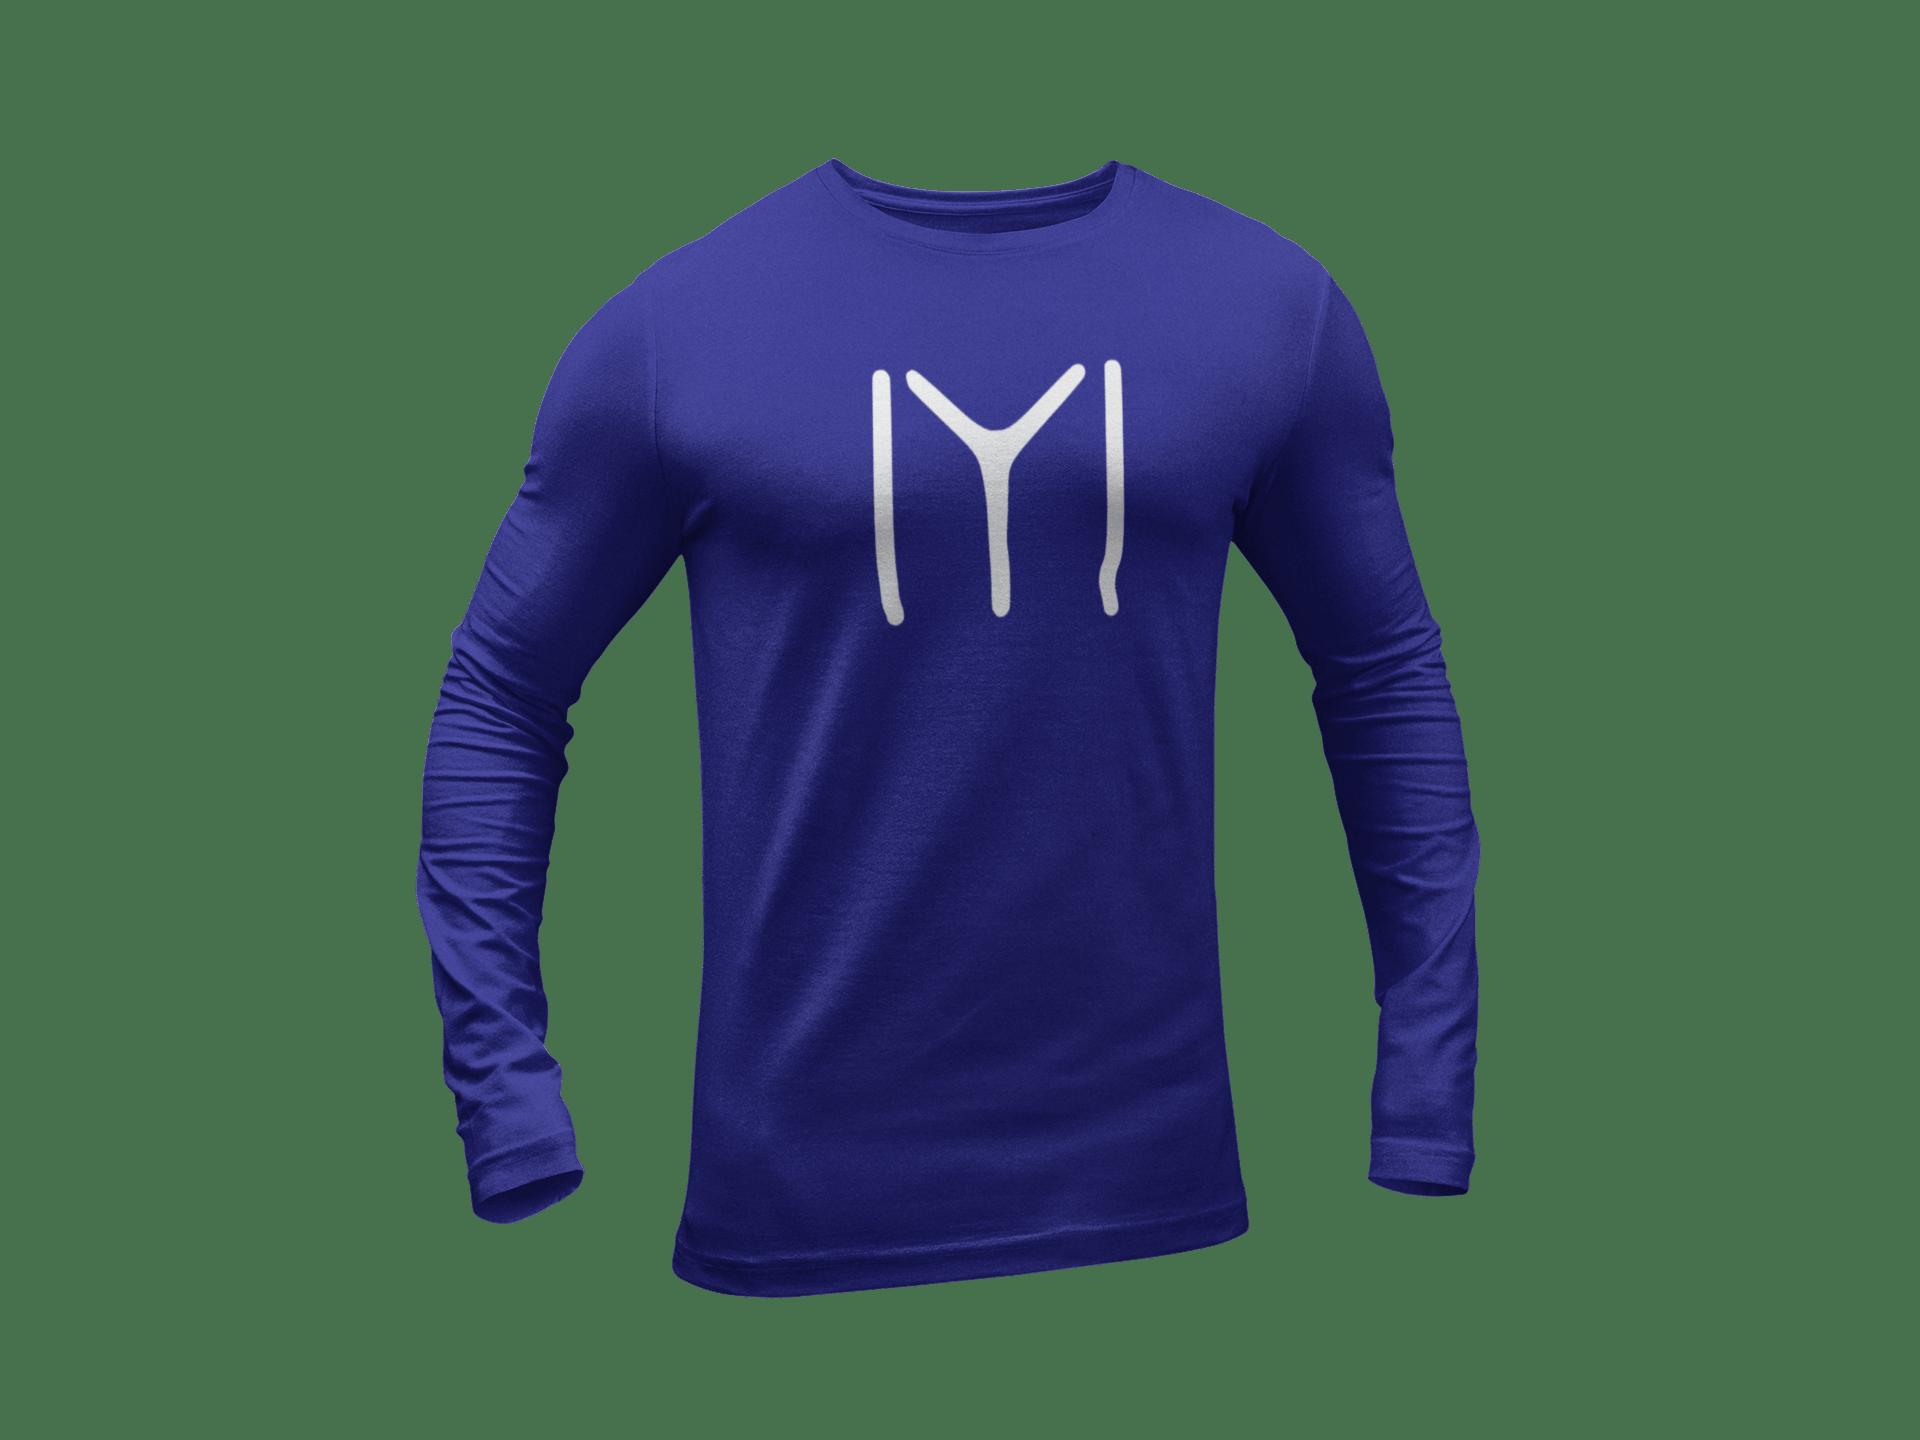 kayi-tribe-flag-full-sleeve-royal-blue-ghosted